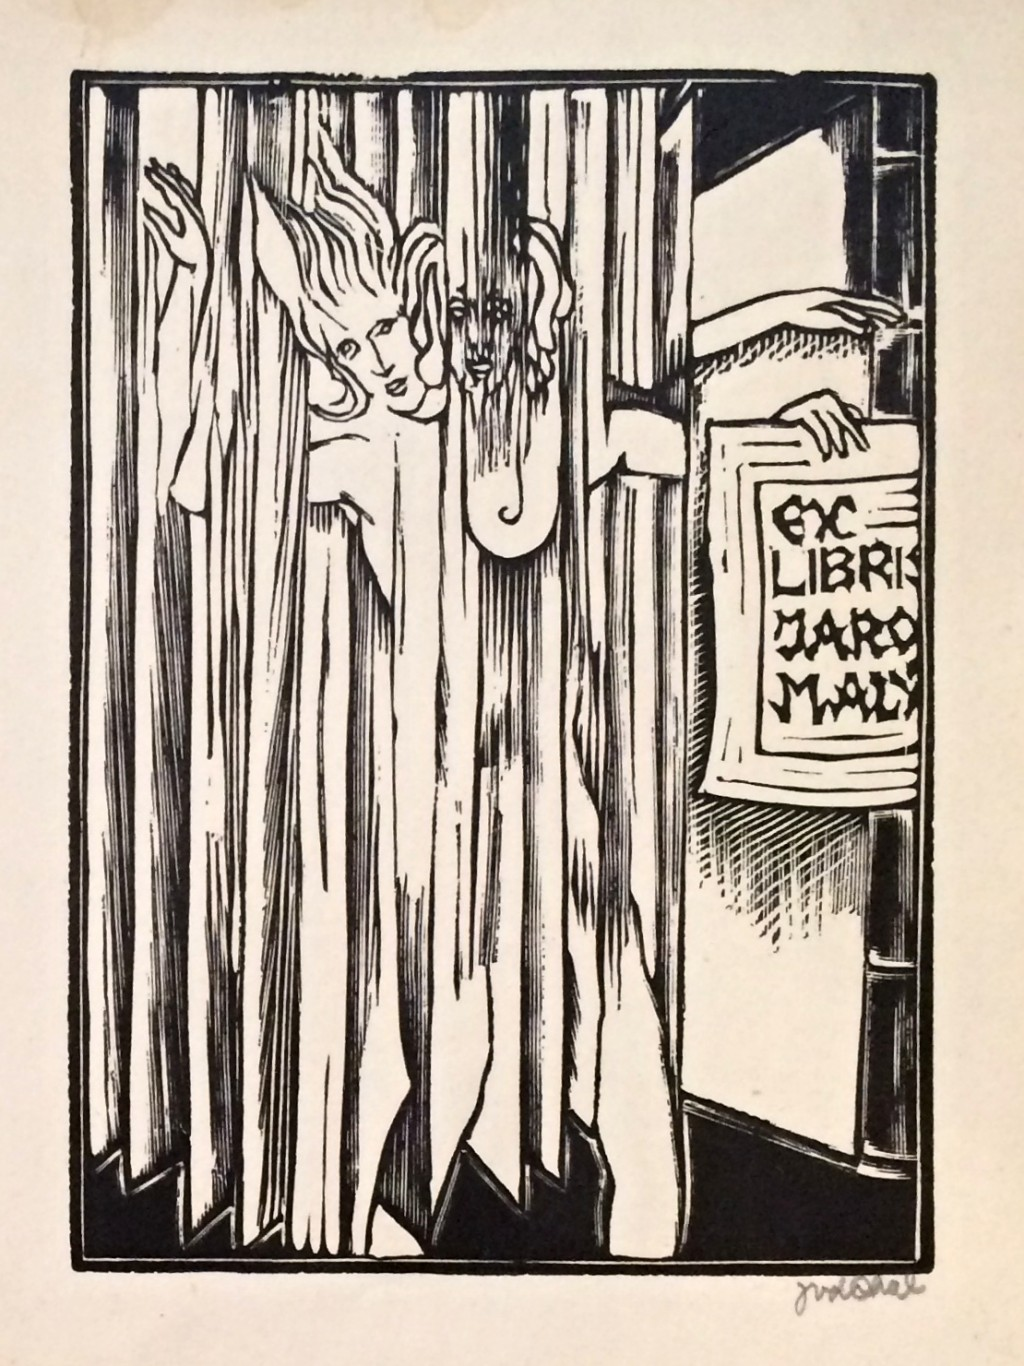 Váchal Josef (1884 - 1969) : Ex libris Jaro Malý